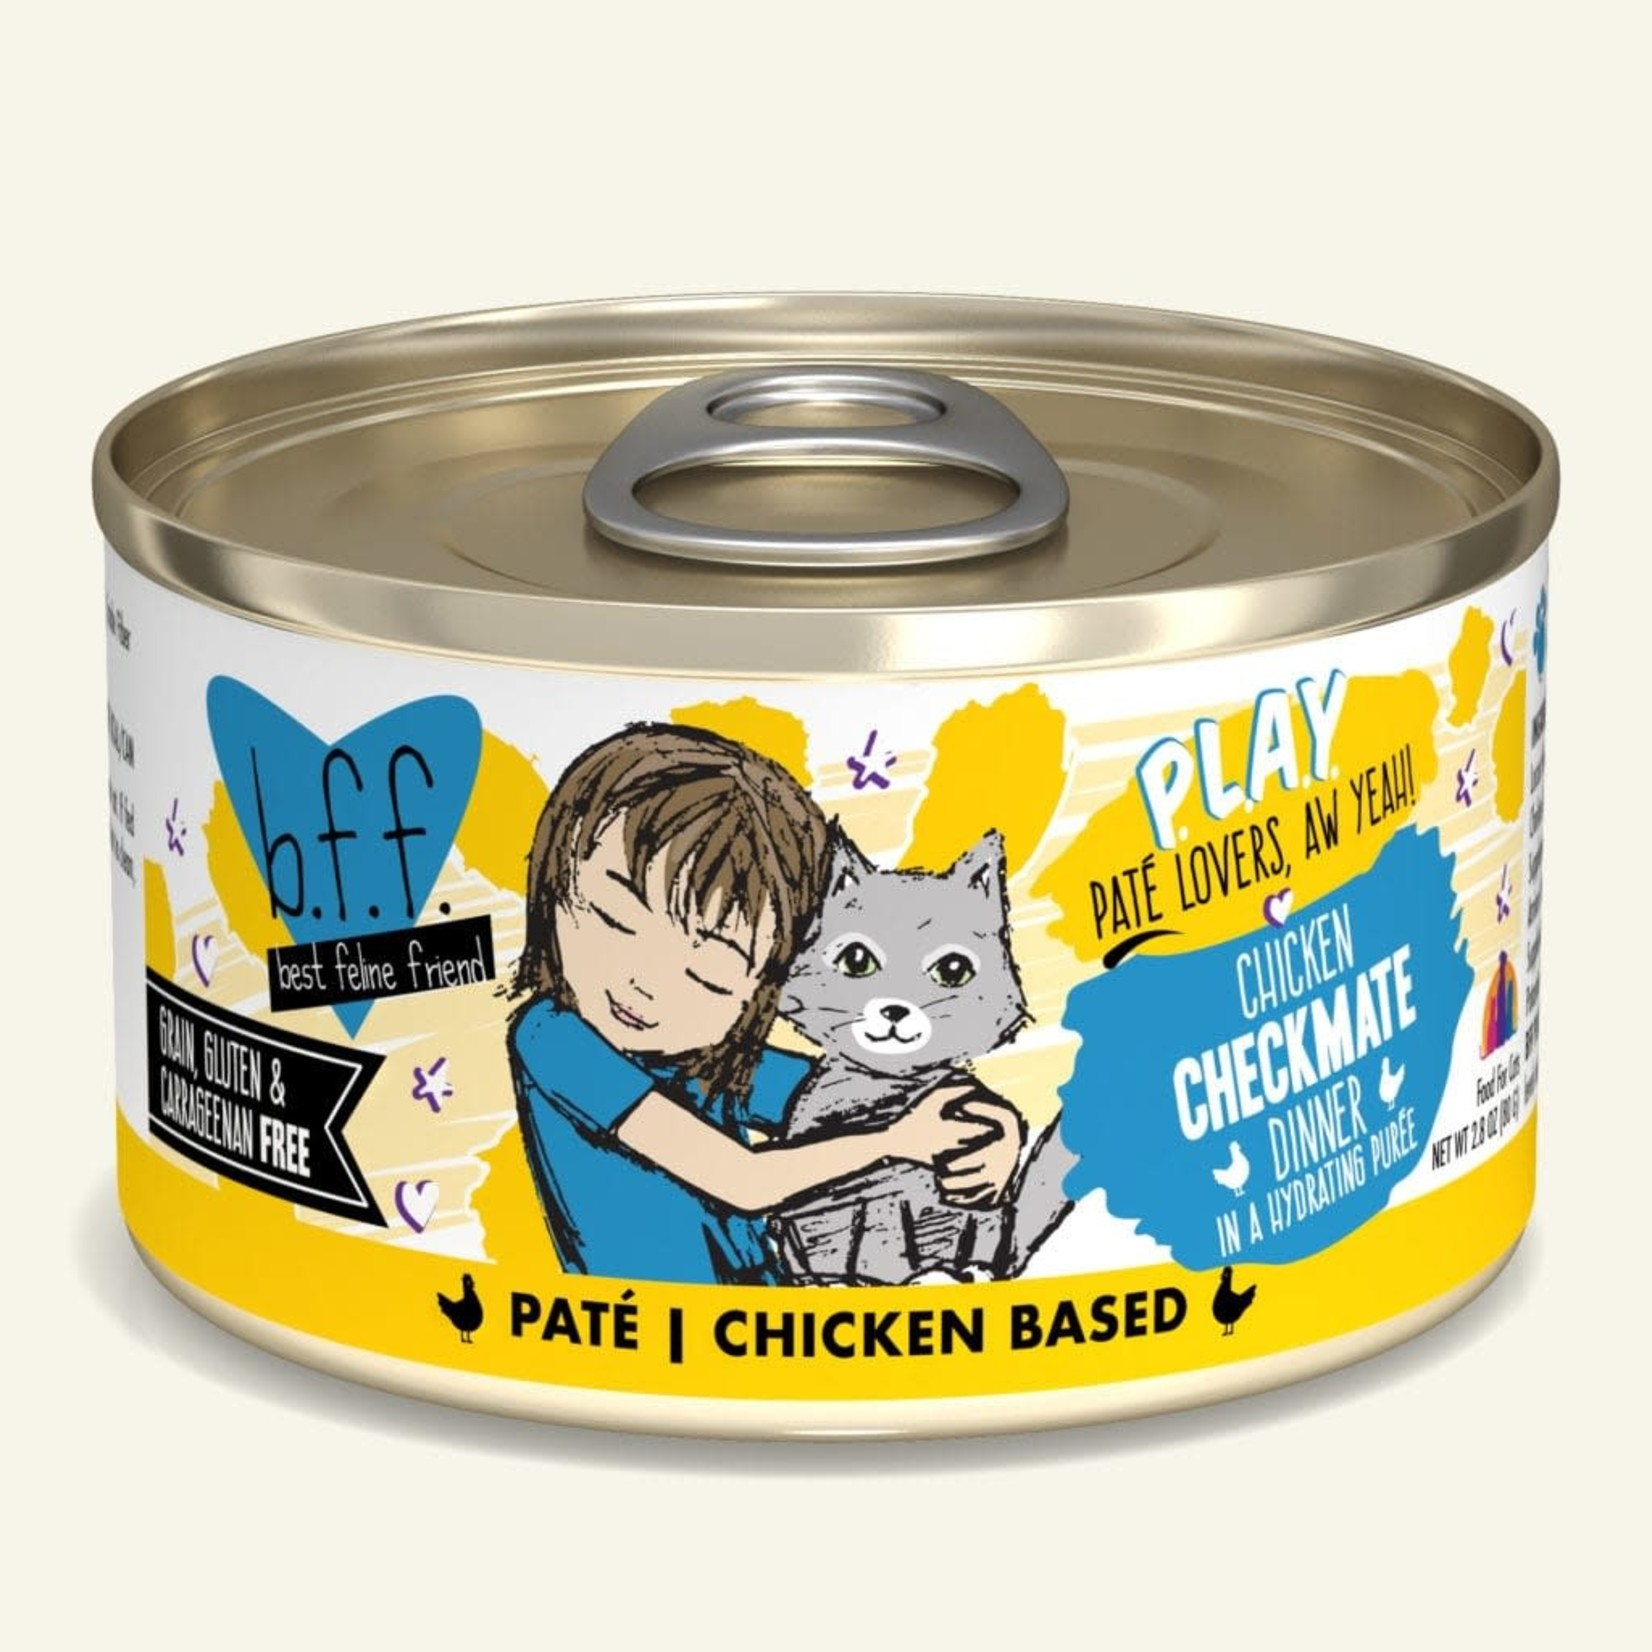 Weruva Inc. BFF PLAY Cat Chicken Checkmate 2.8 OZ